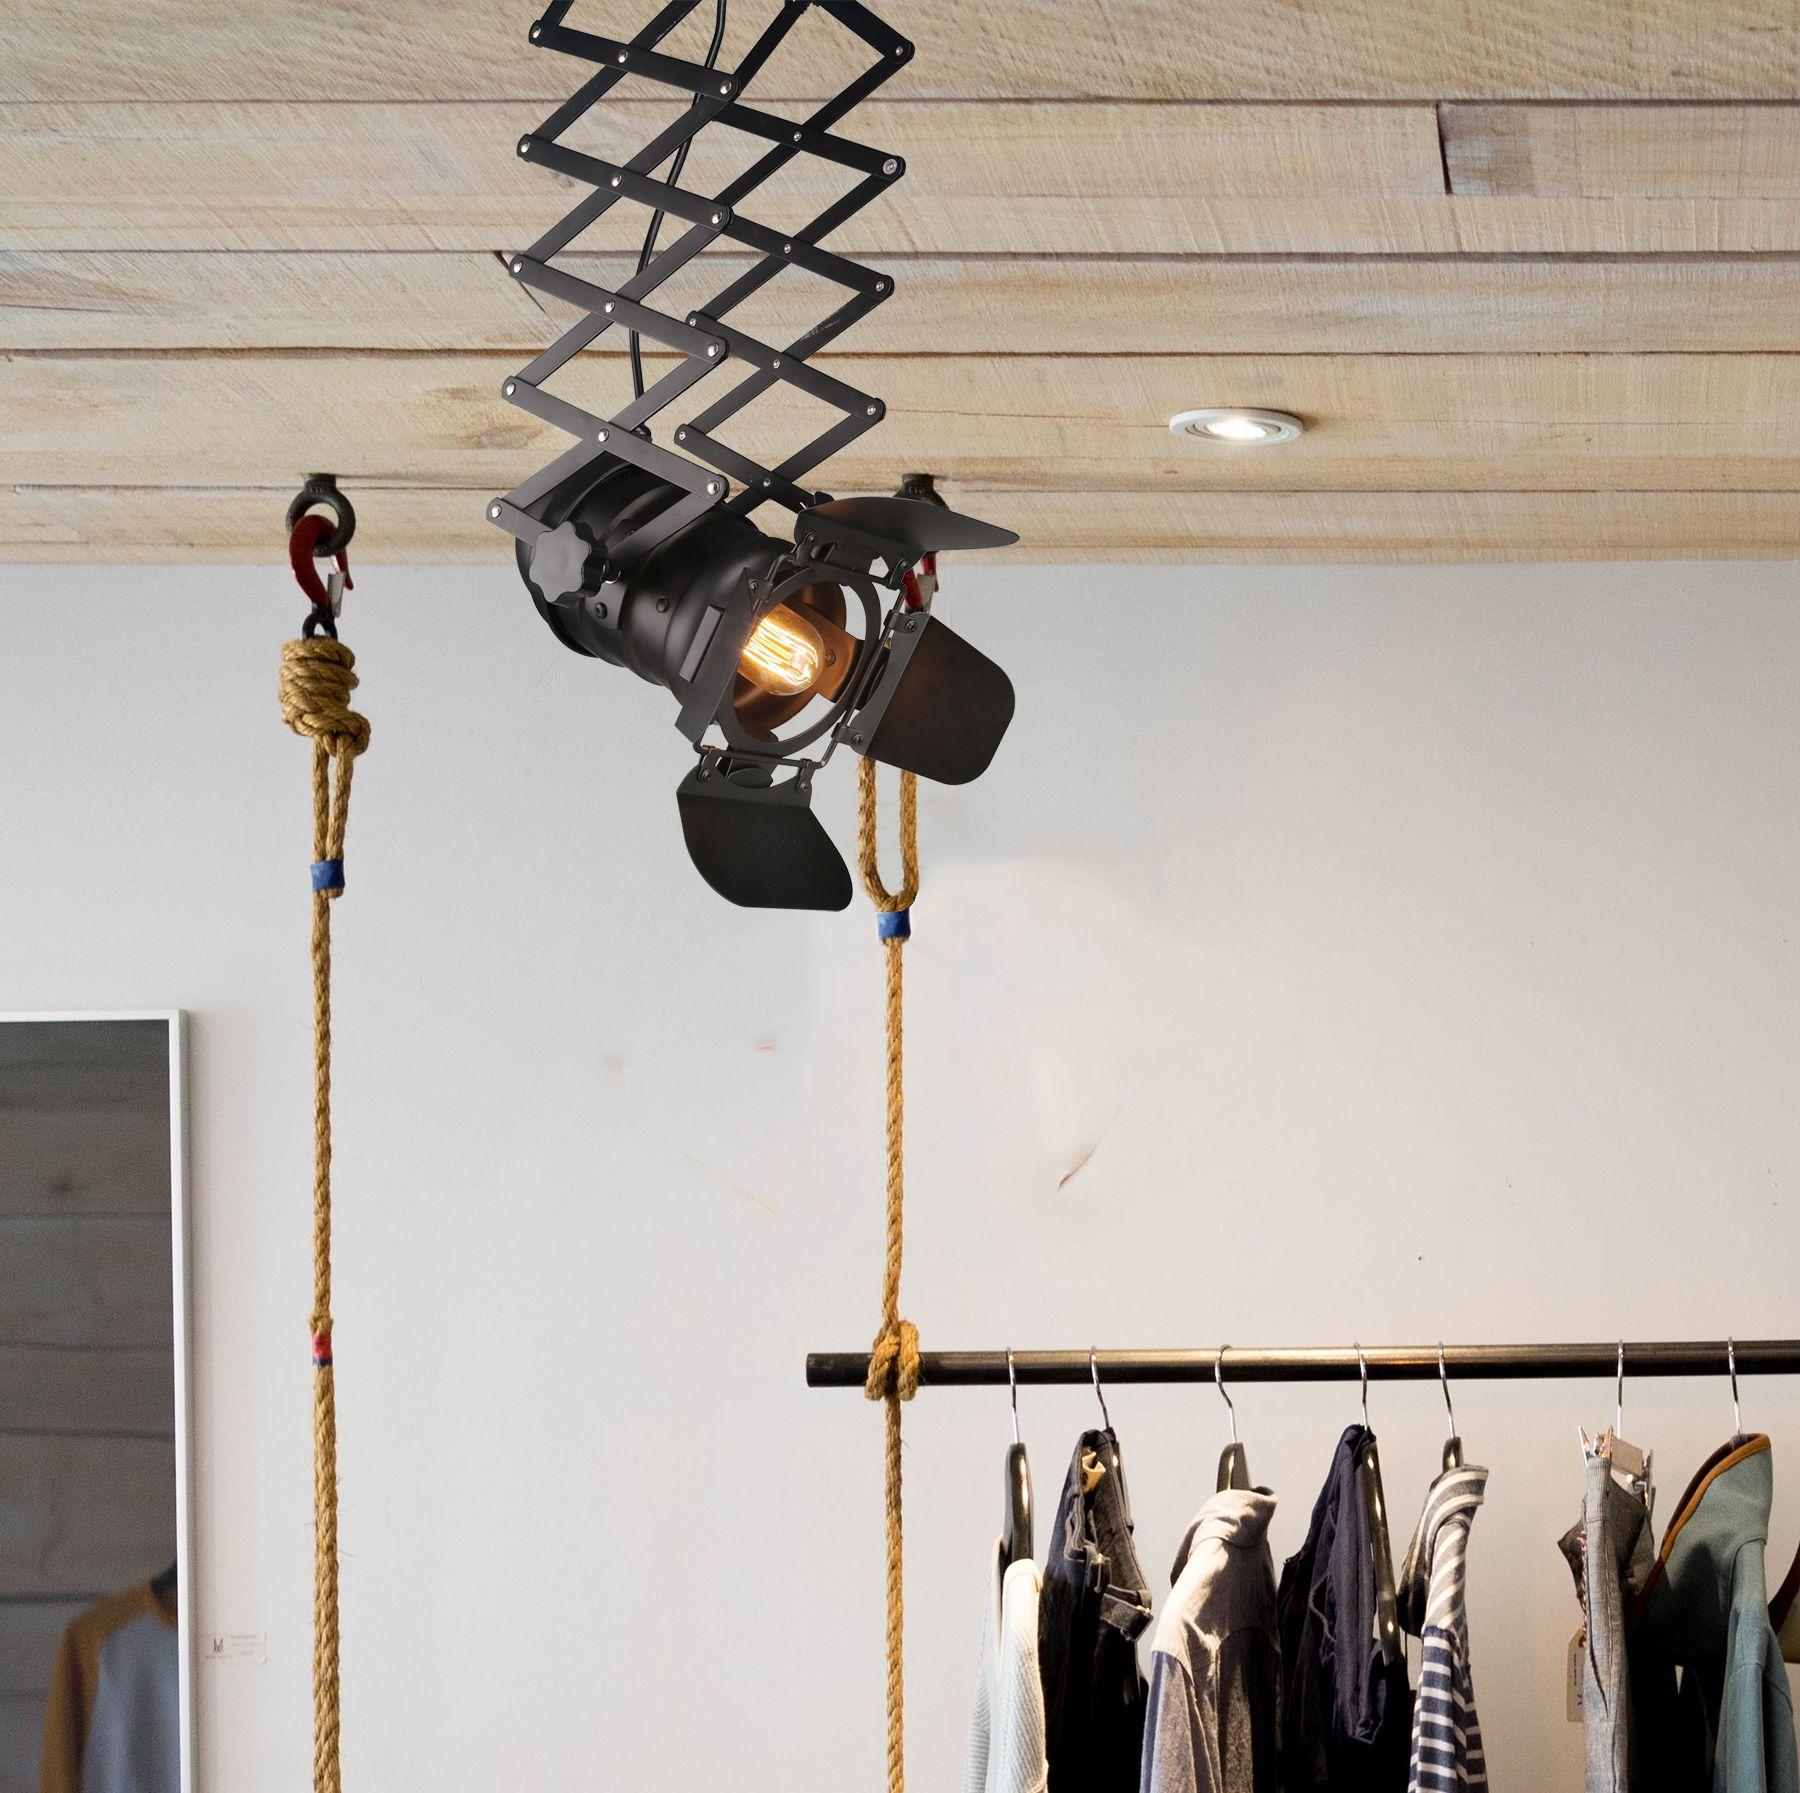 Lights & Lighting Ceiling Lights & Fans Provided Nordic Led Monkey Resin Pendant Lights Restaurant Luminaria Hanging Lamp Bedroom Bar Kitchen Fixtures Luminaire Pendant Light Dependable Performance